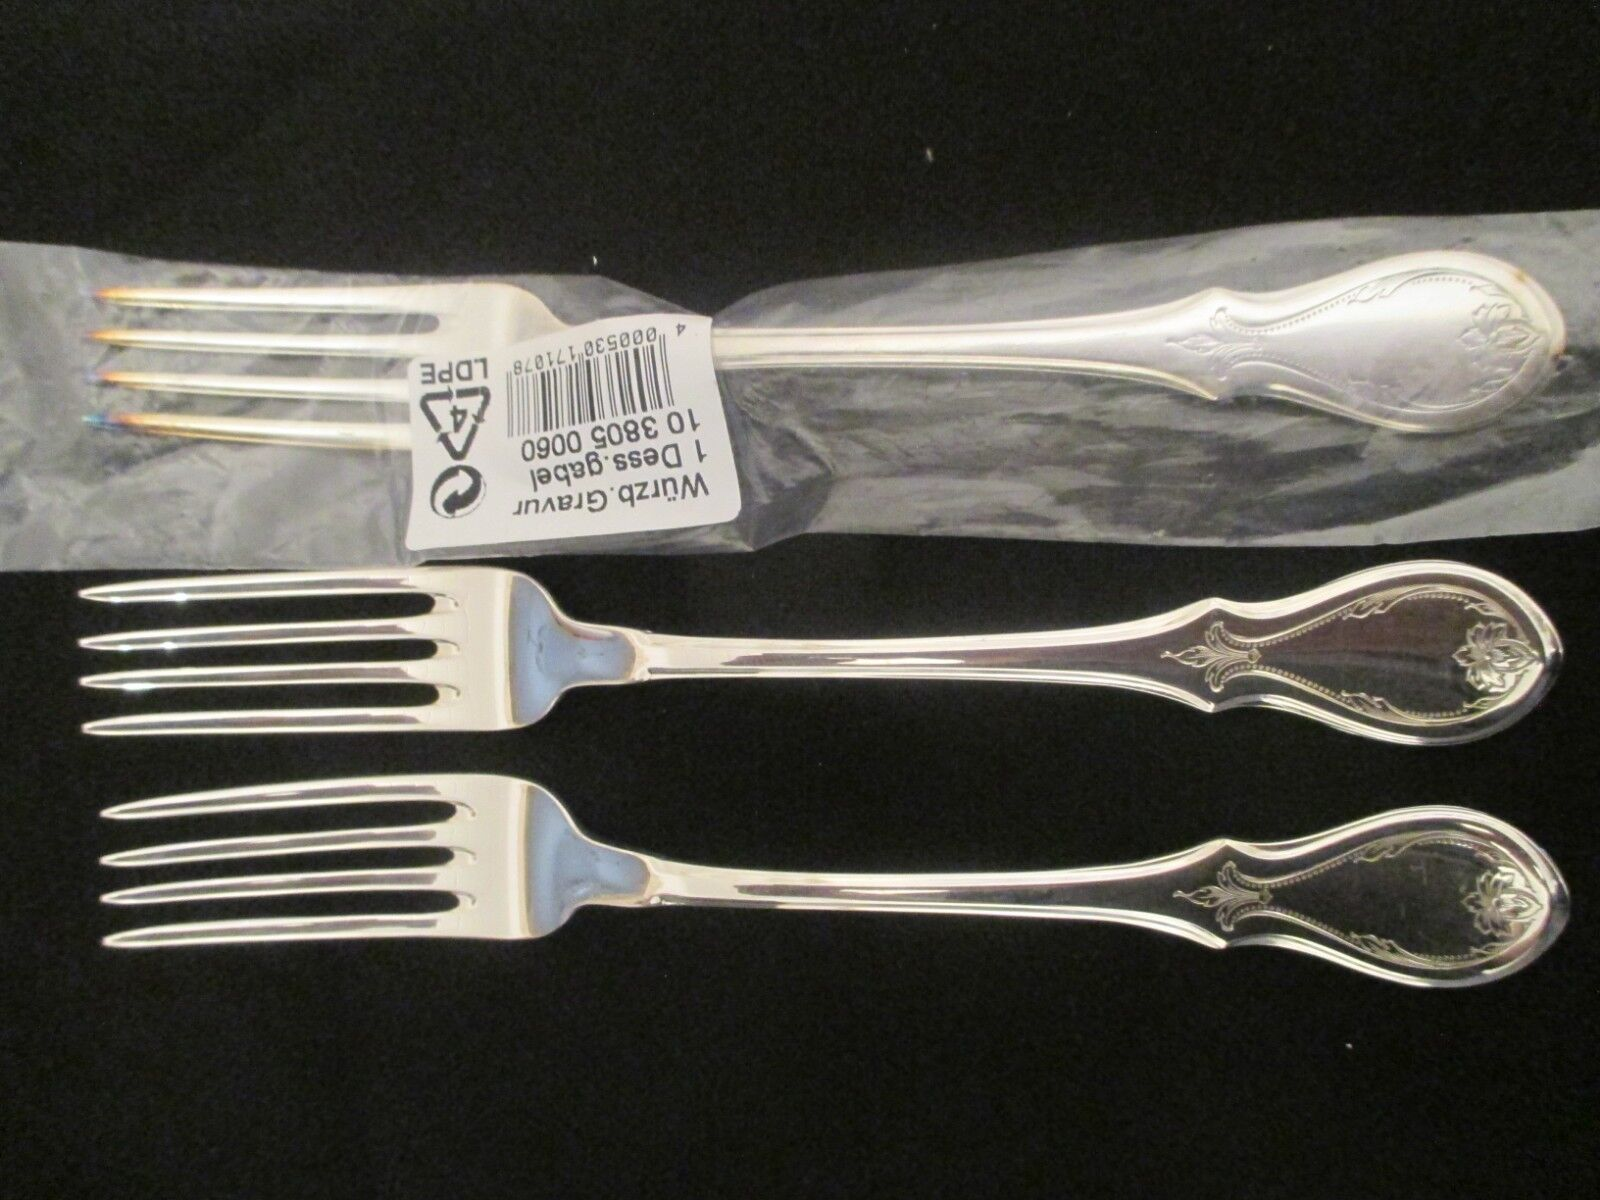 WMF Würzburger Gravur 90 90 90 Silber 3 Dessertgabel 18,3 cm Vorspeisegabel Gabel TOP | Online-verkauf  a7c2bb